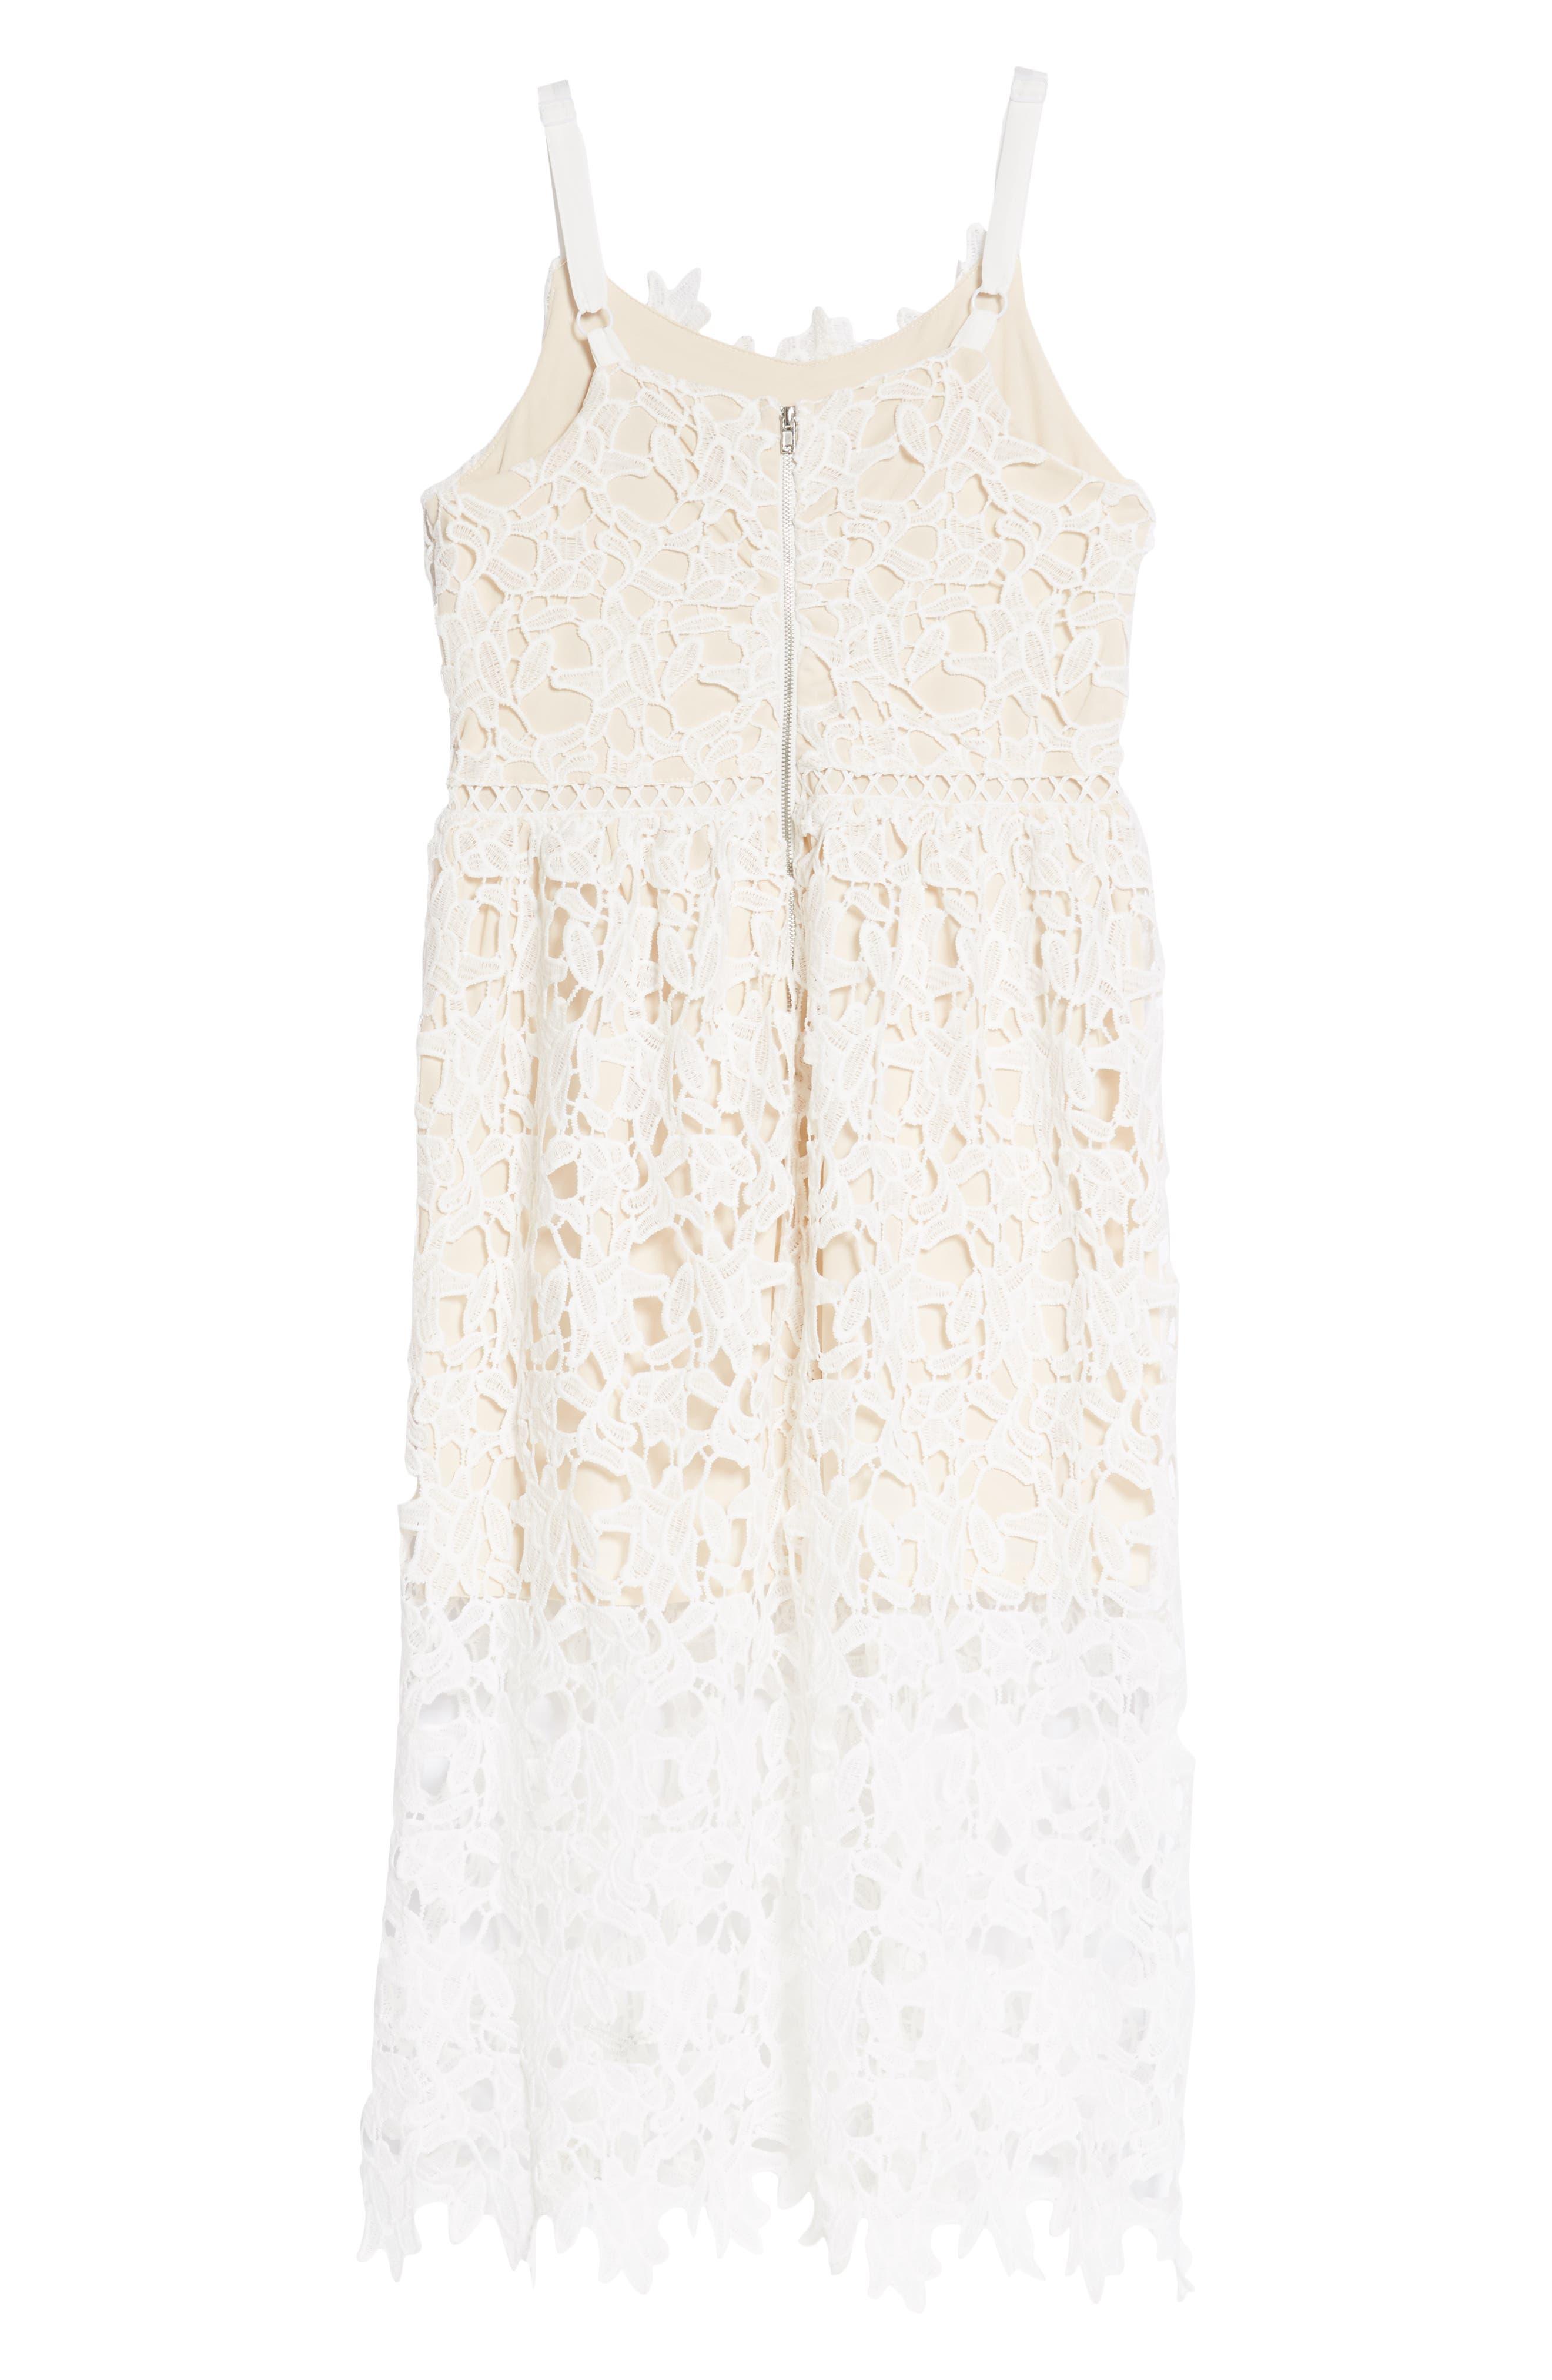 Floral Lace Dress,                             Alternate thumbnail 2, color,                             White/ Tan